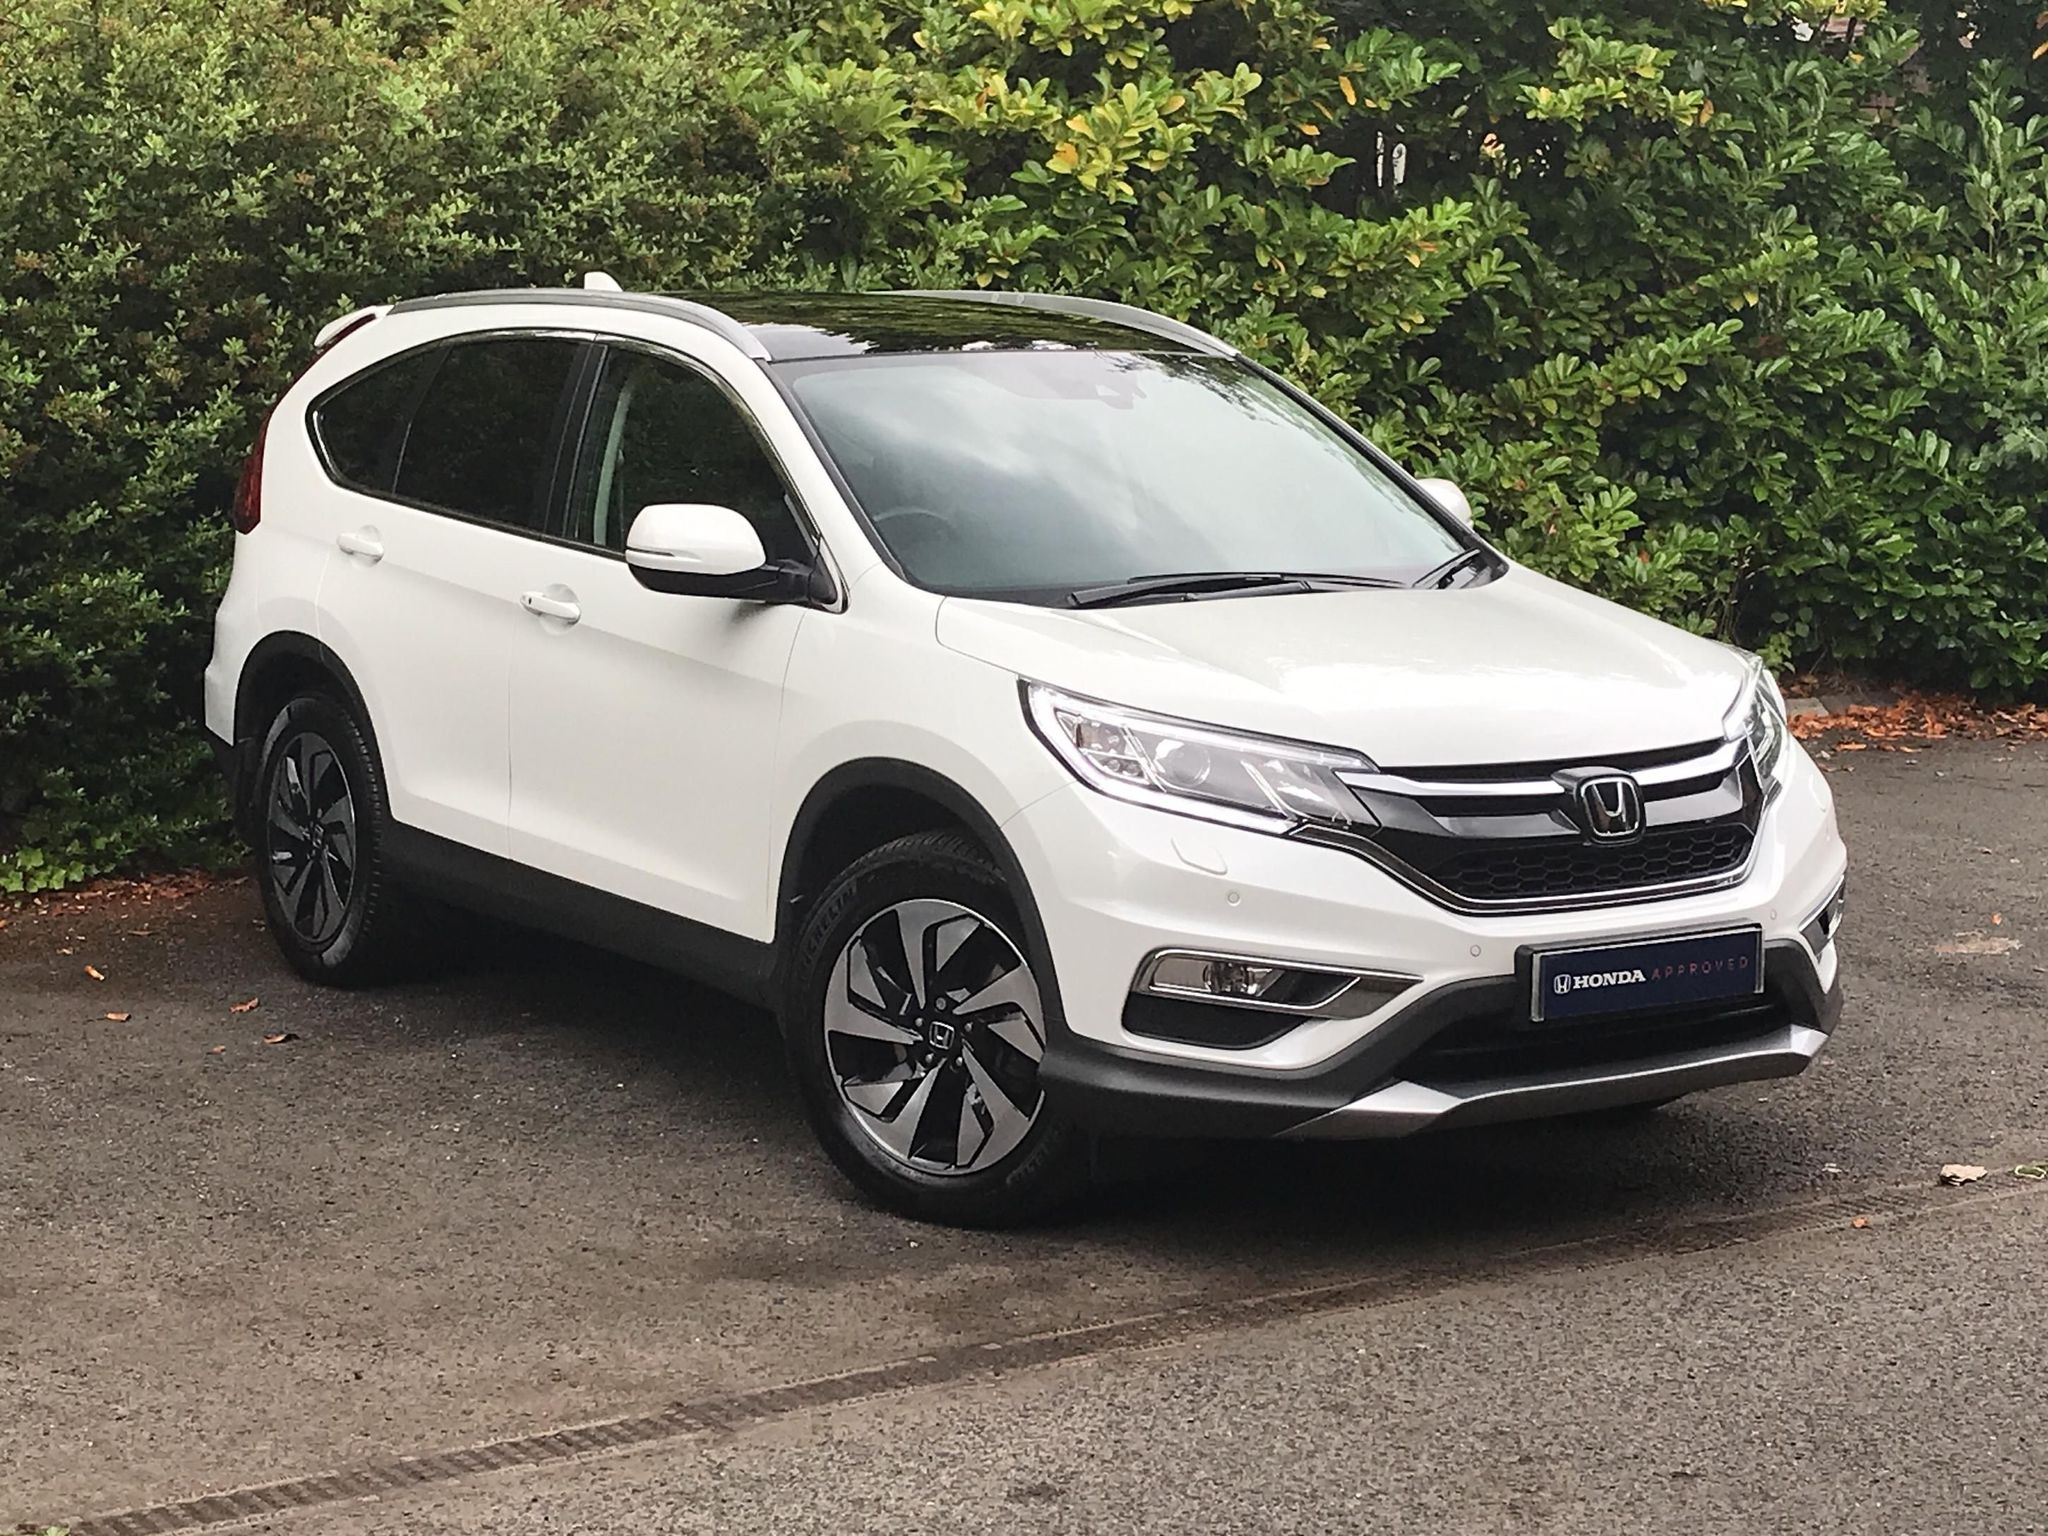 Honda CR-V 1.6 i-DTEC EX (Sensing) Auto 4WD 5dr